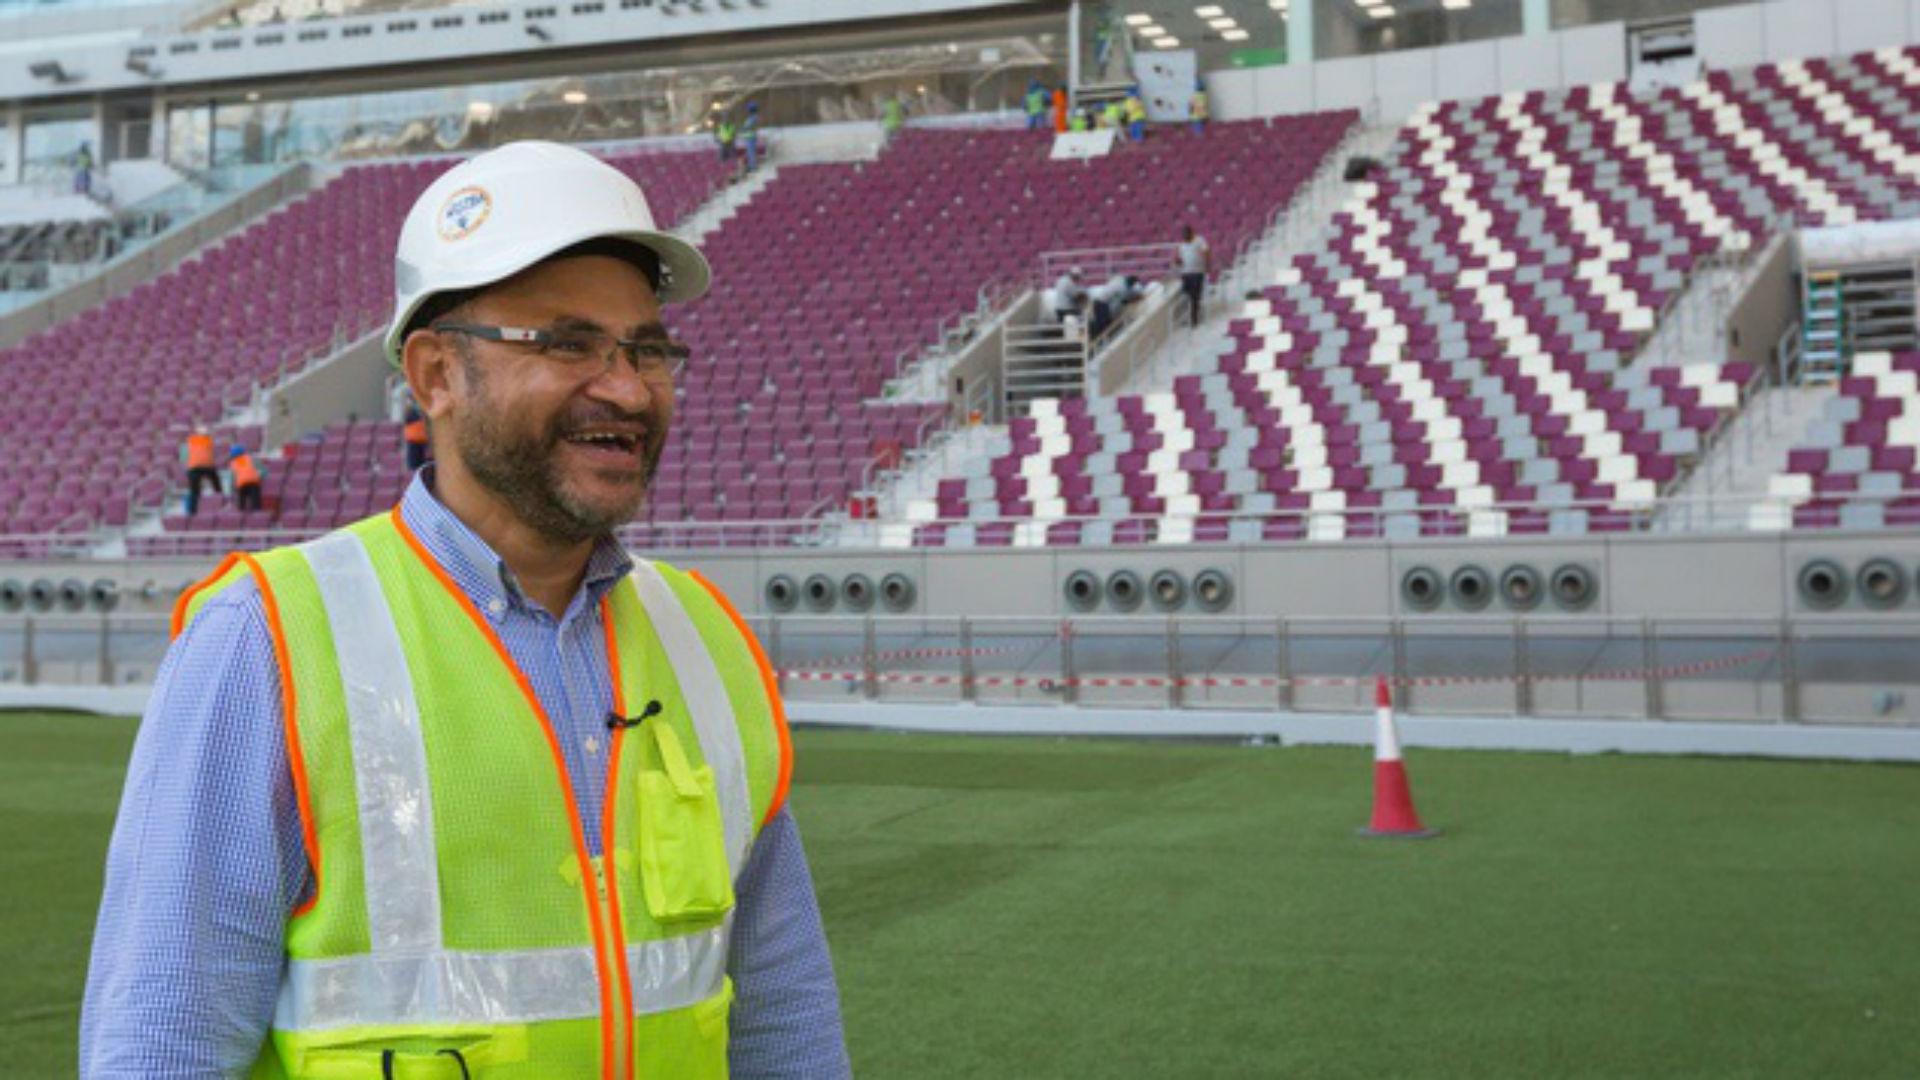 2022 World Cup: USA and Mexico will need Qatar's cooling technology, says engineer Saud Abdul Ghani